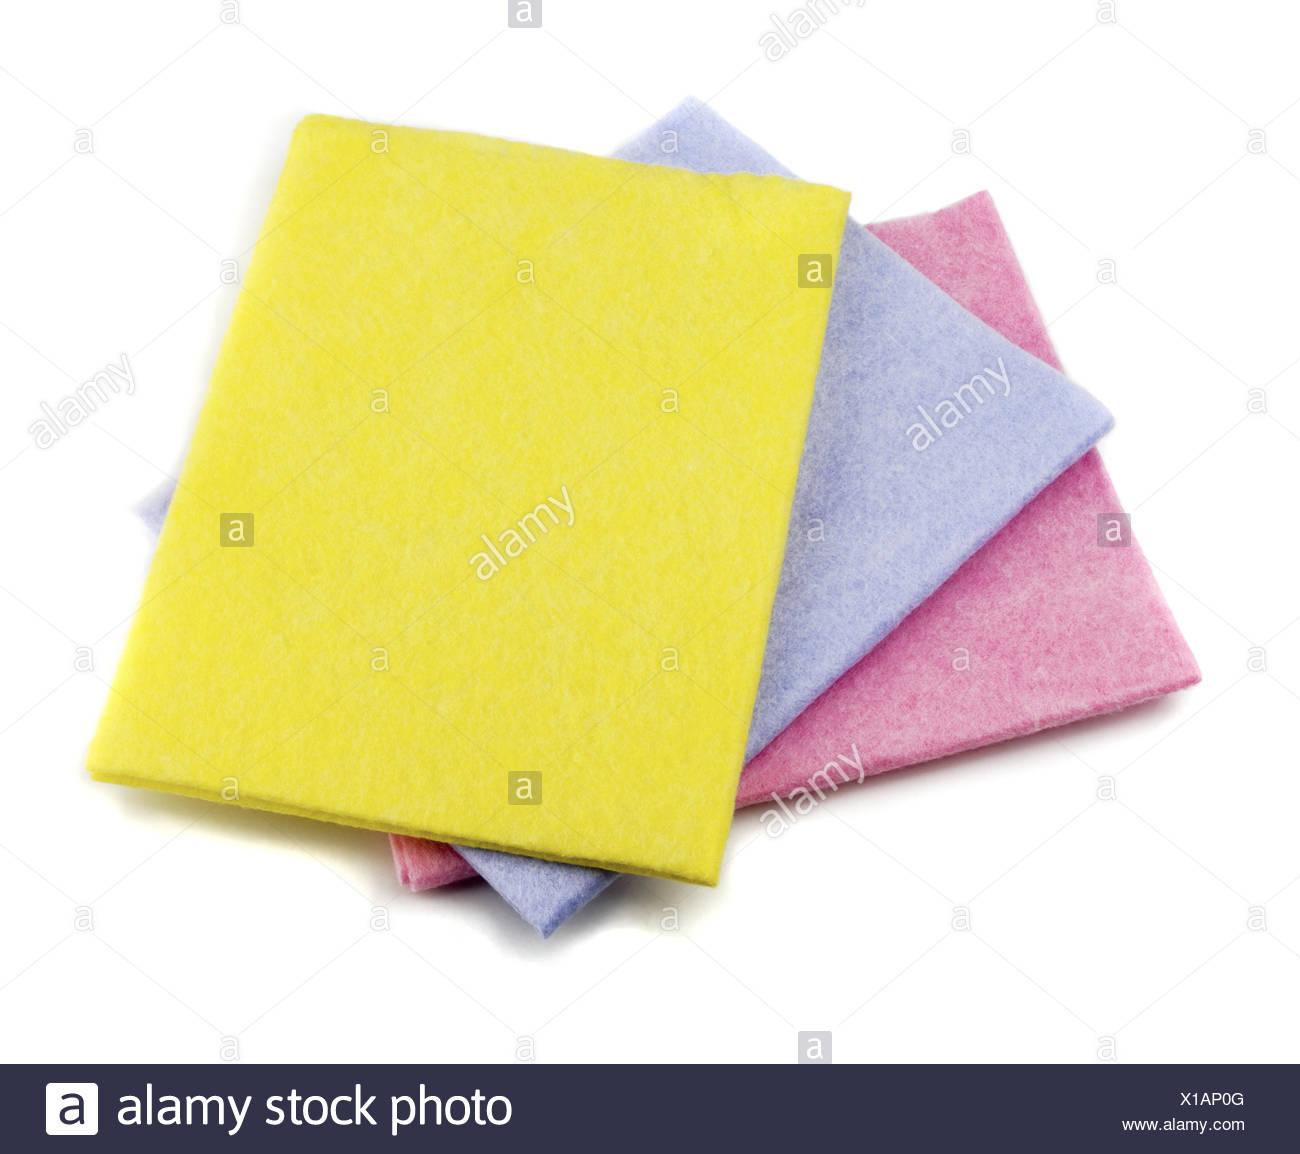 Kitchen napkins - Stock Image